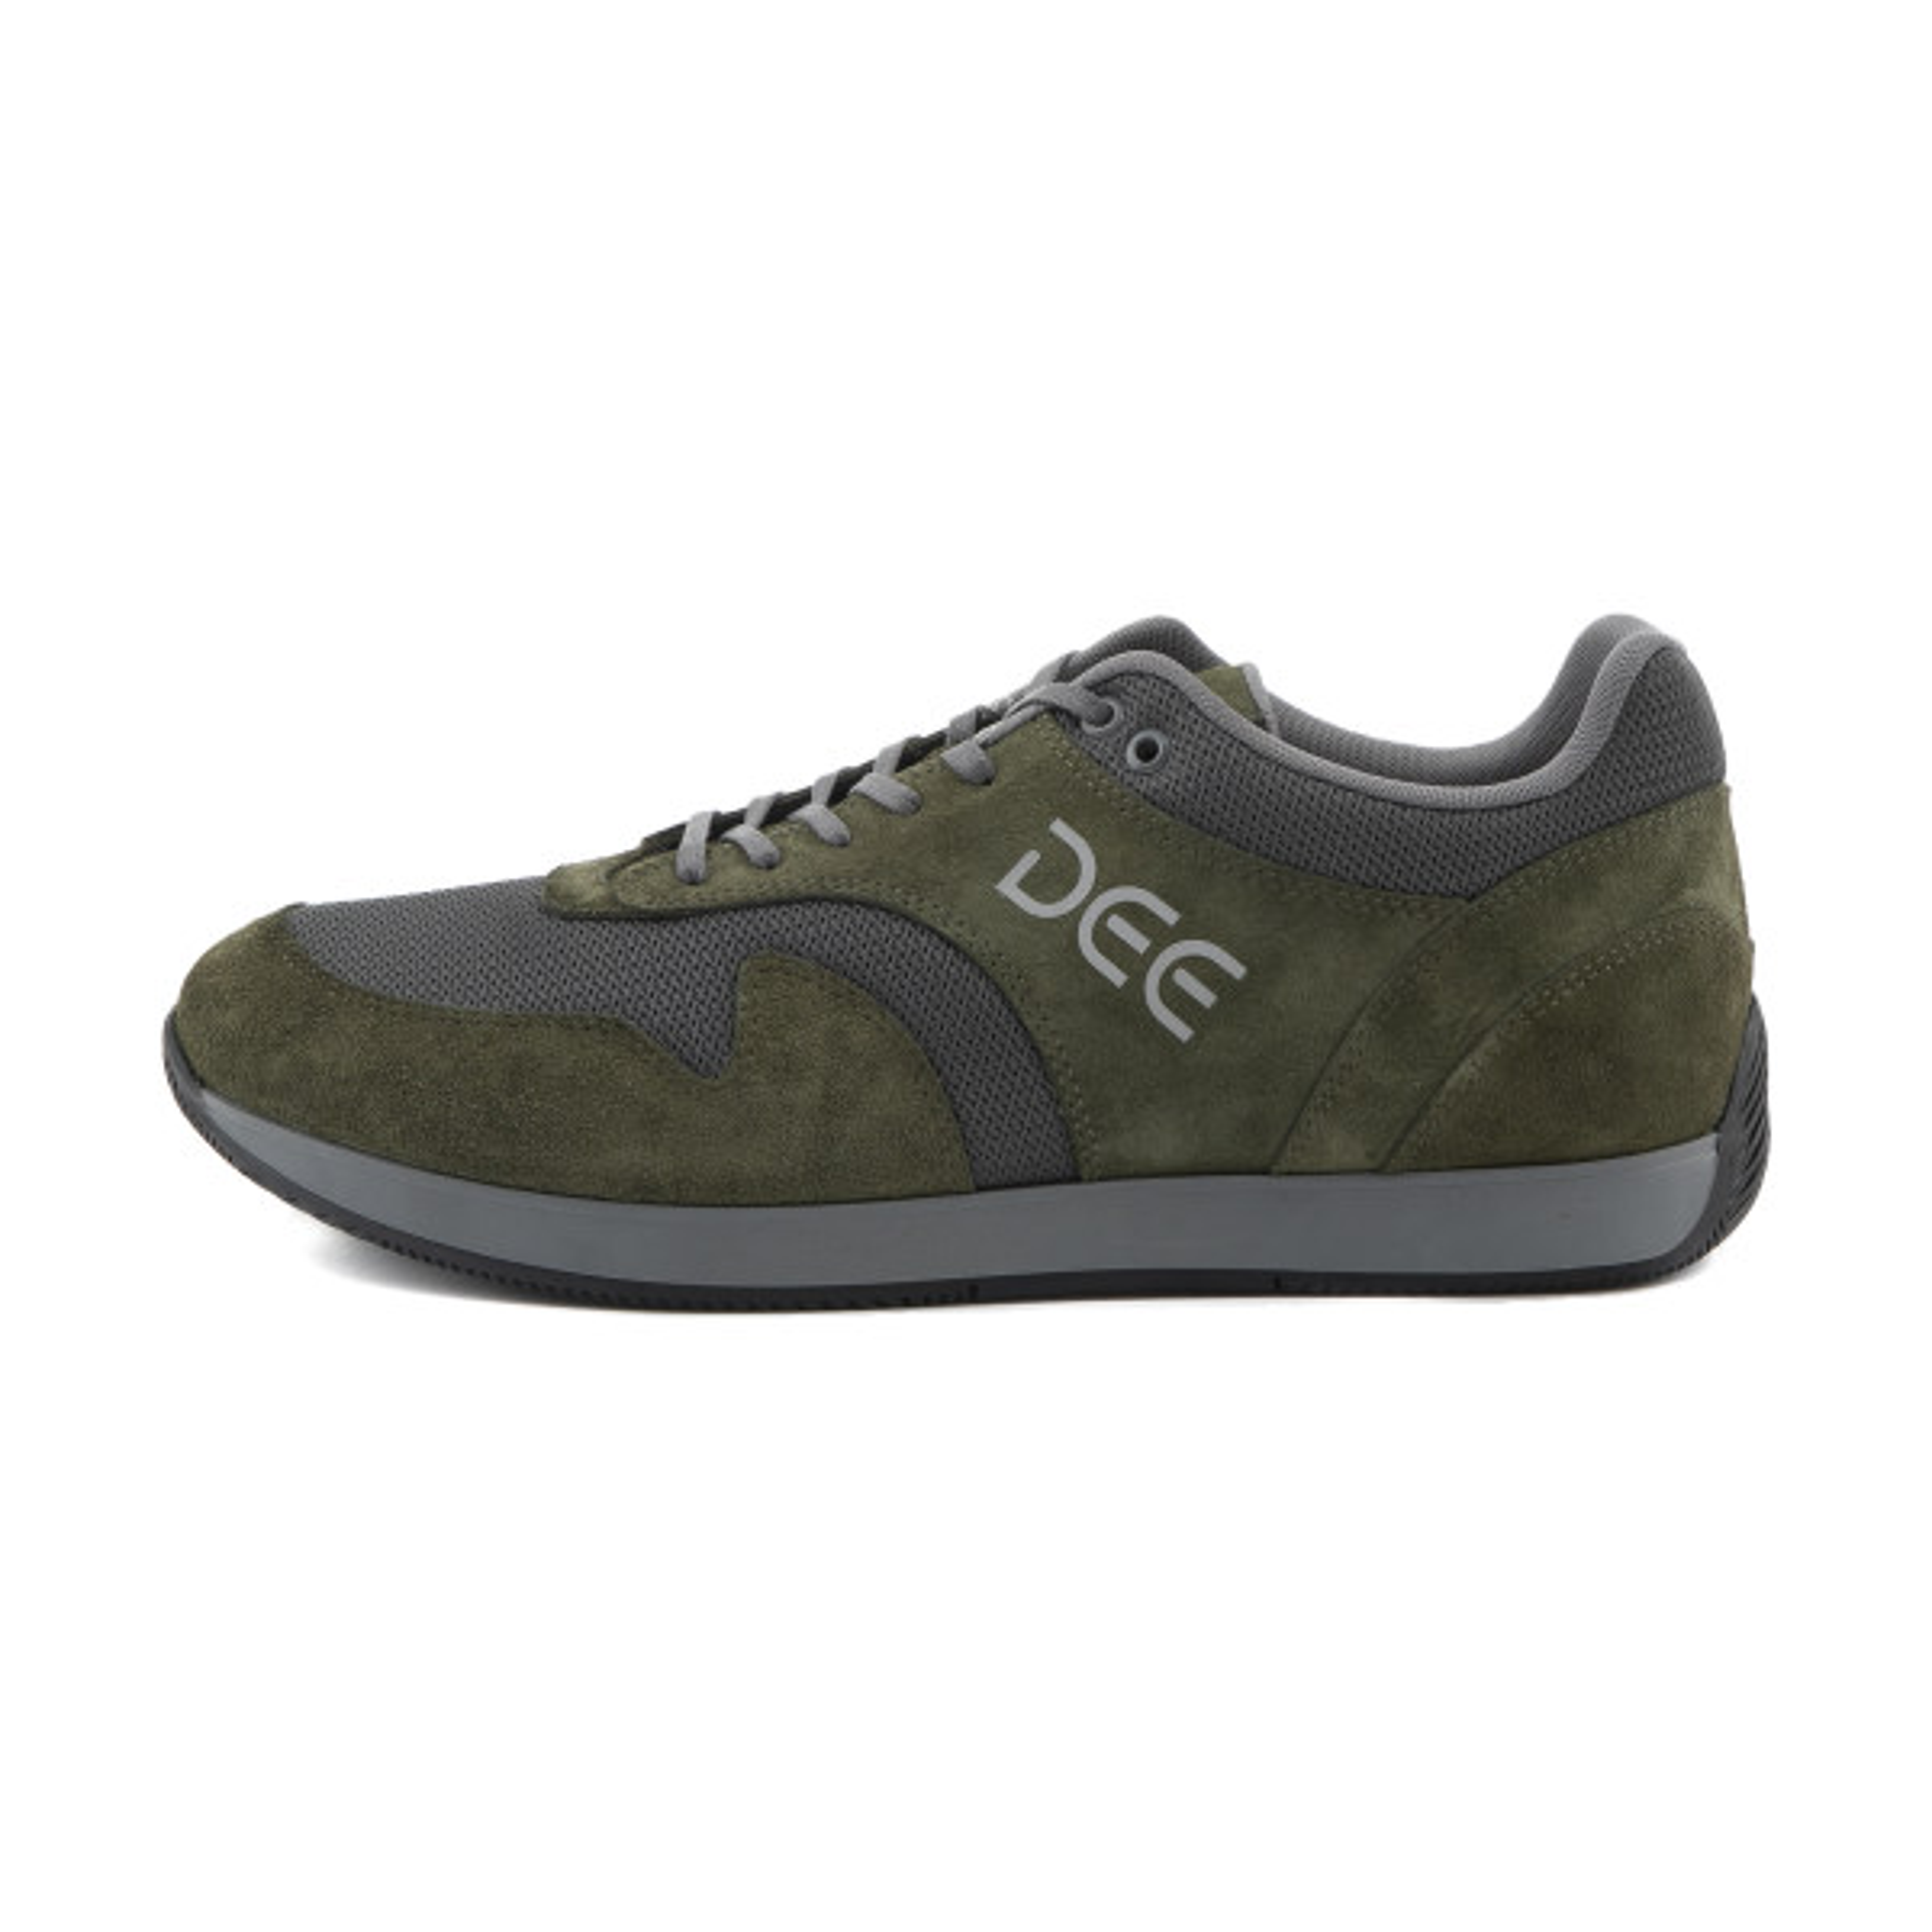 کفش روزمره مردانه دنیلی مدل Dani M-227180219751